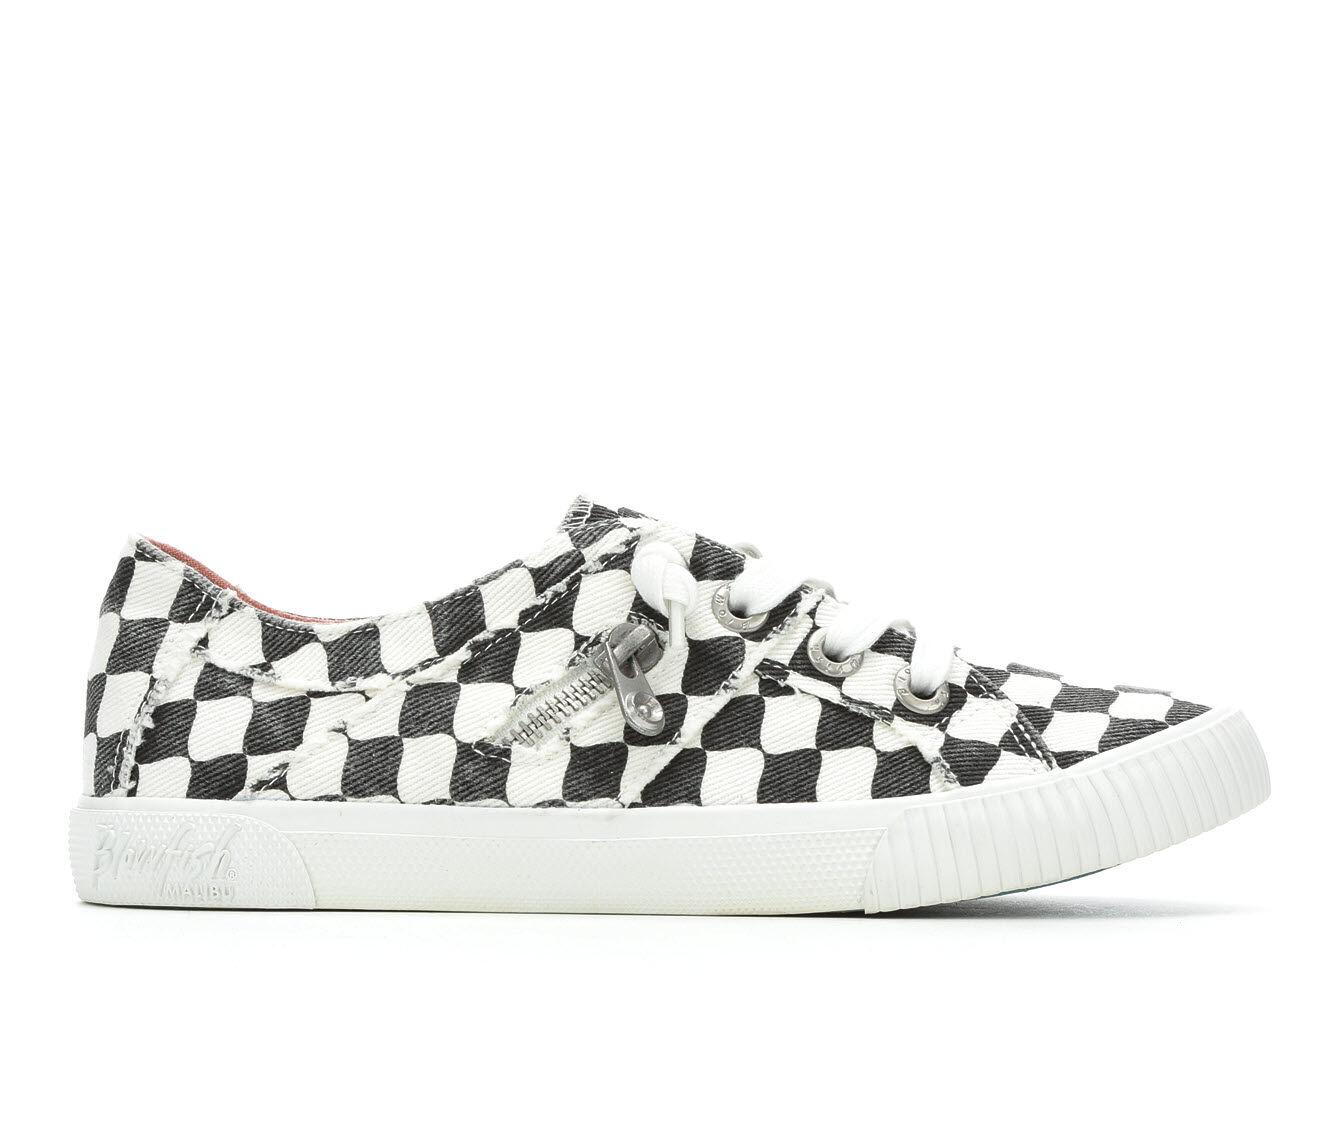 Women's Blowfish Malibu Fruit Sneakers Off White Check